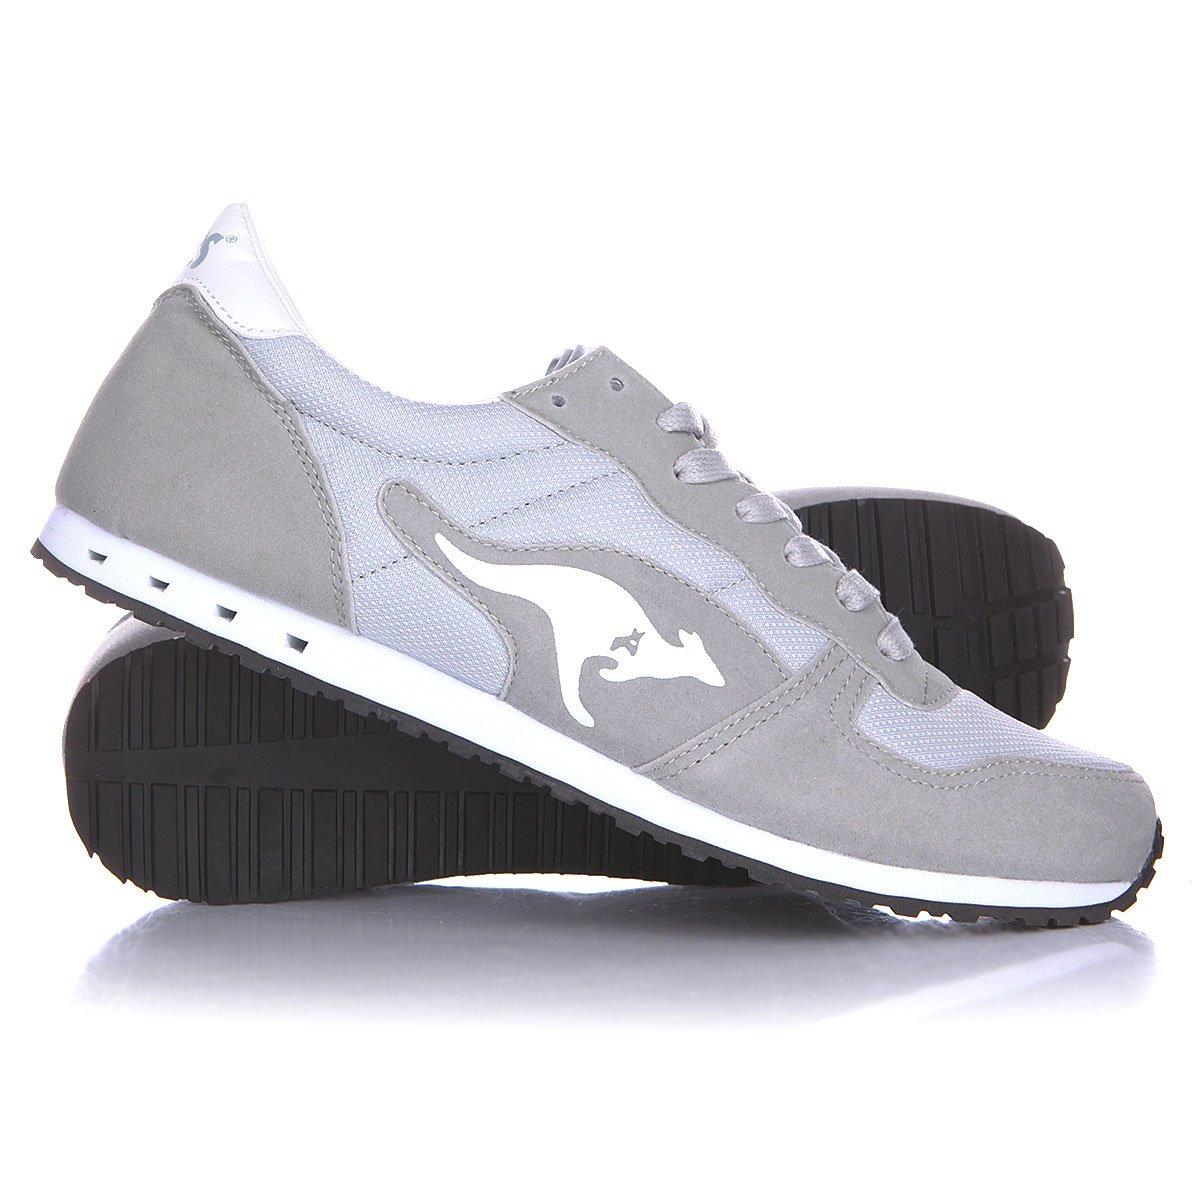 76ed61a7 Купить кроссовки Kangaroos Blaze Iii Semi Grey/White в интернет ...